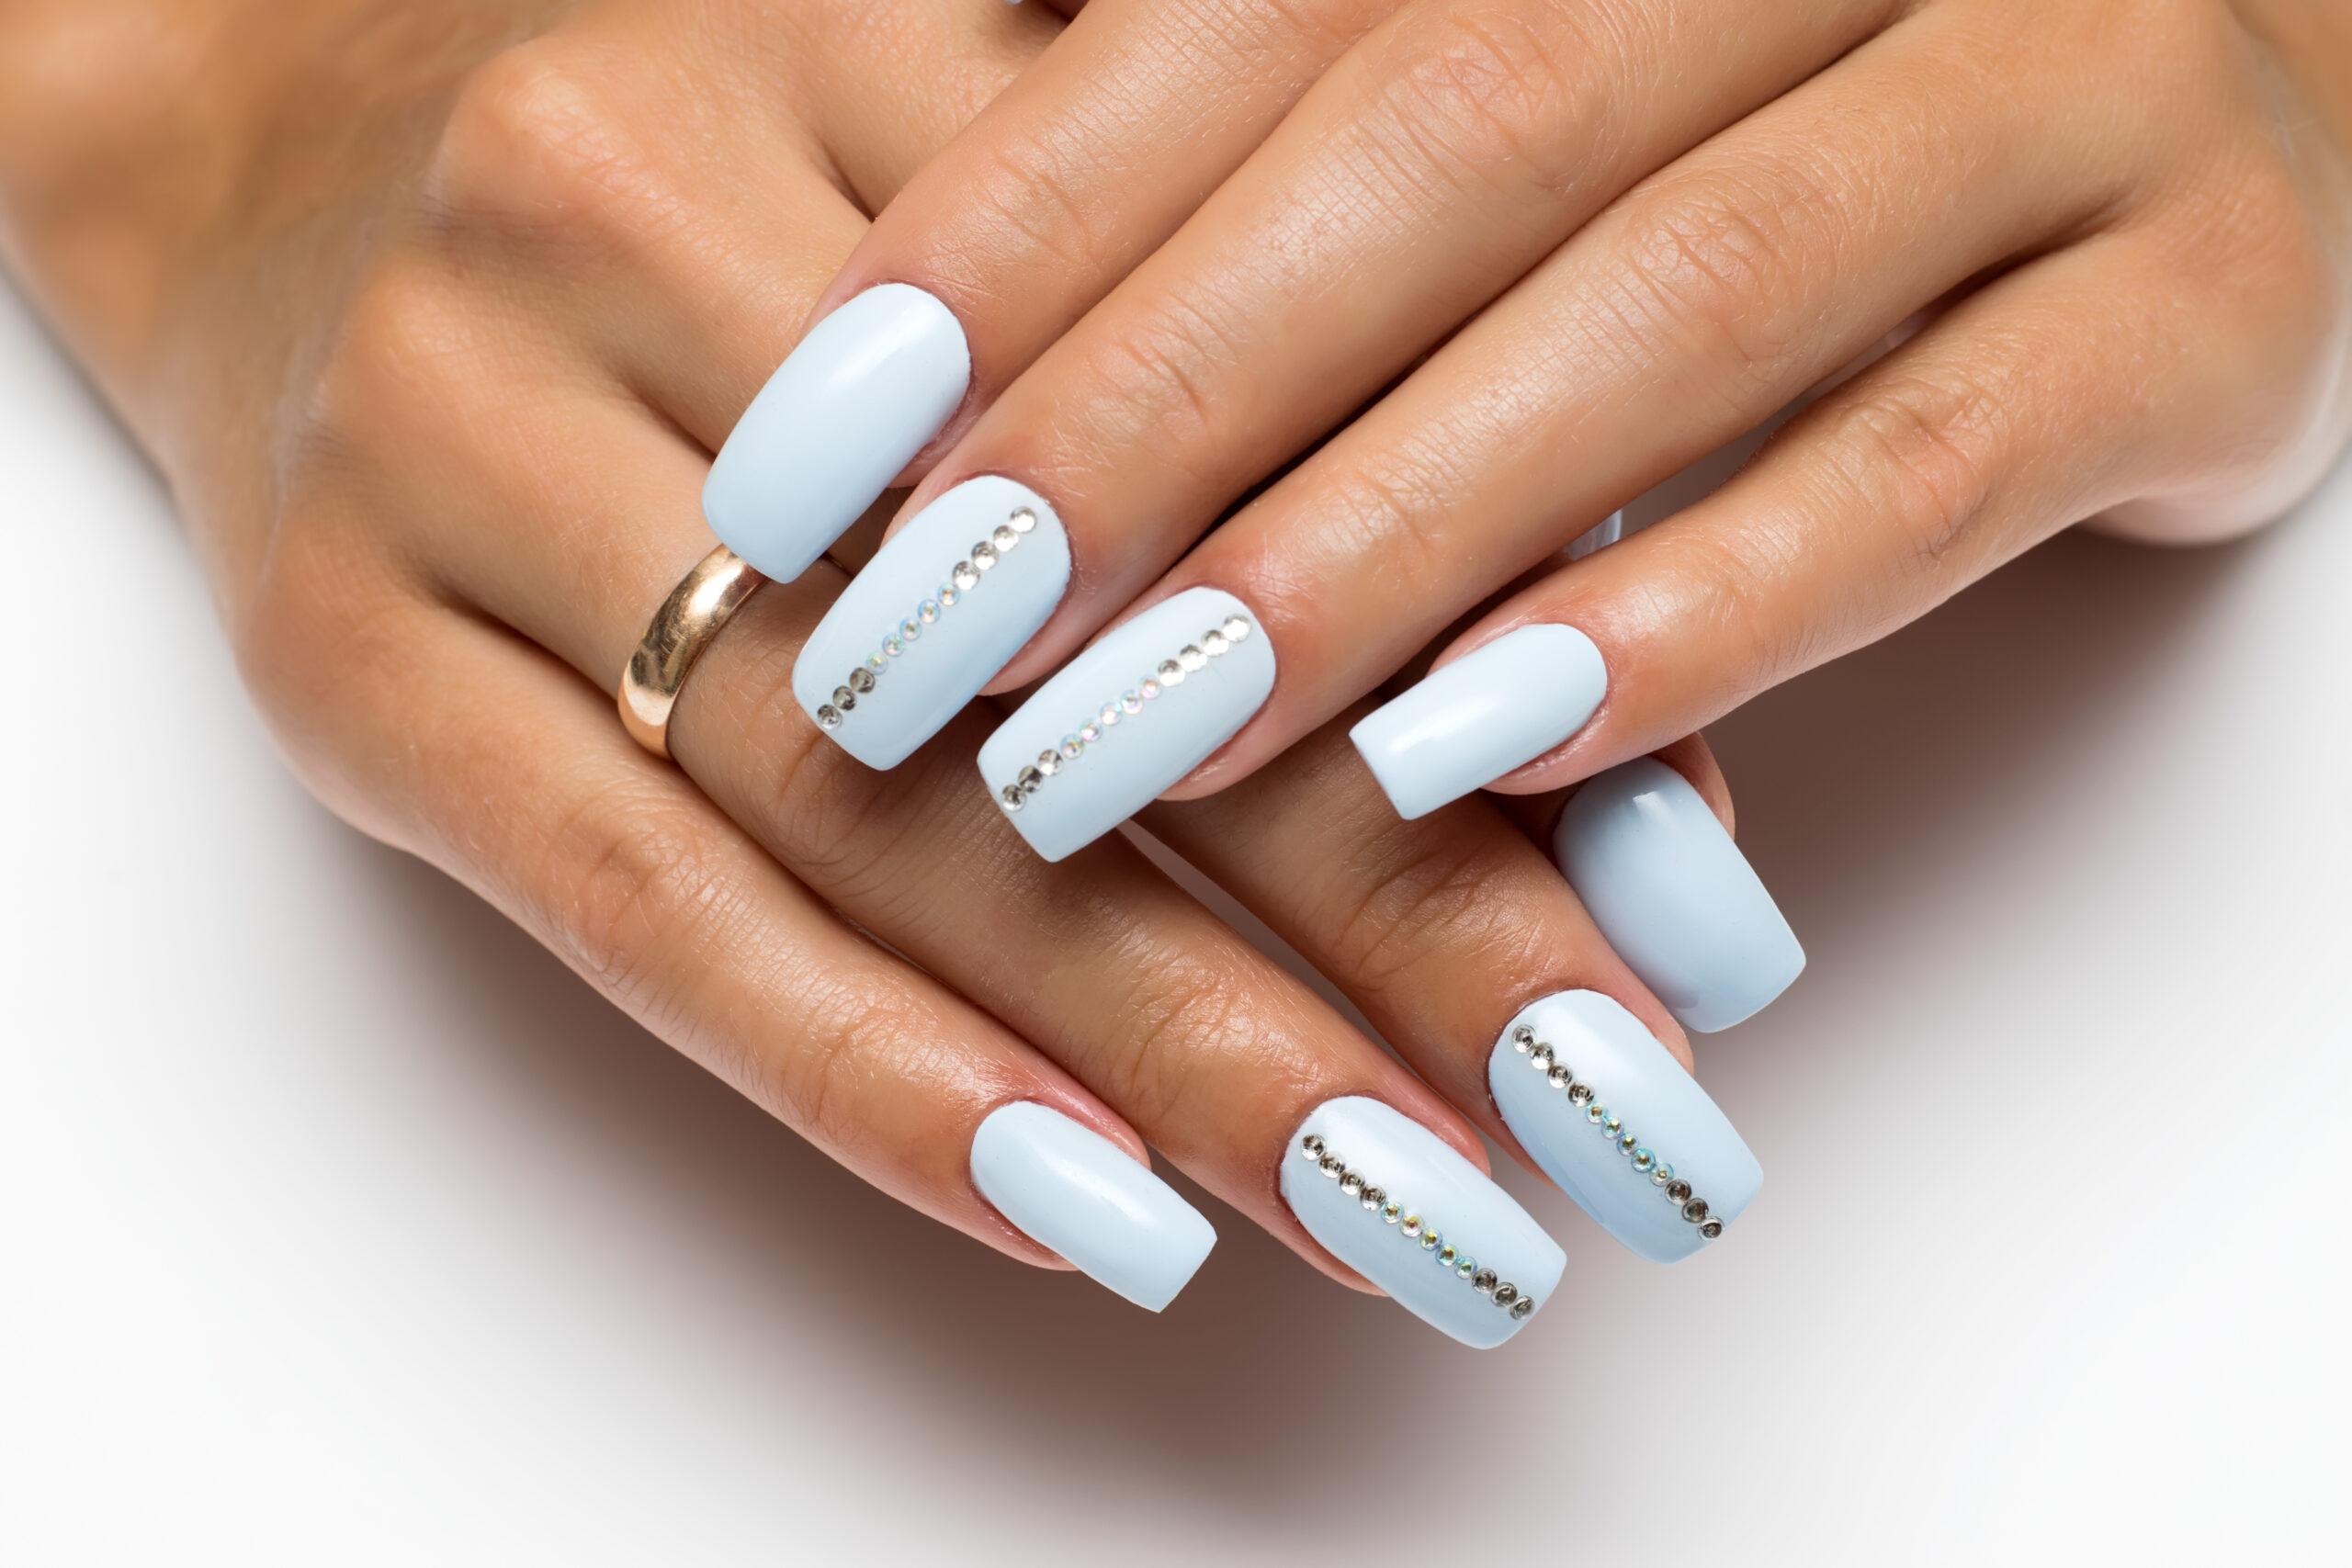 błękitne paznokcie na ślub z cyrkoniami